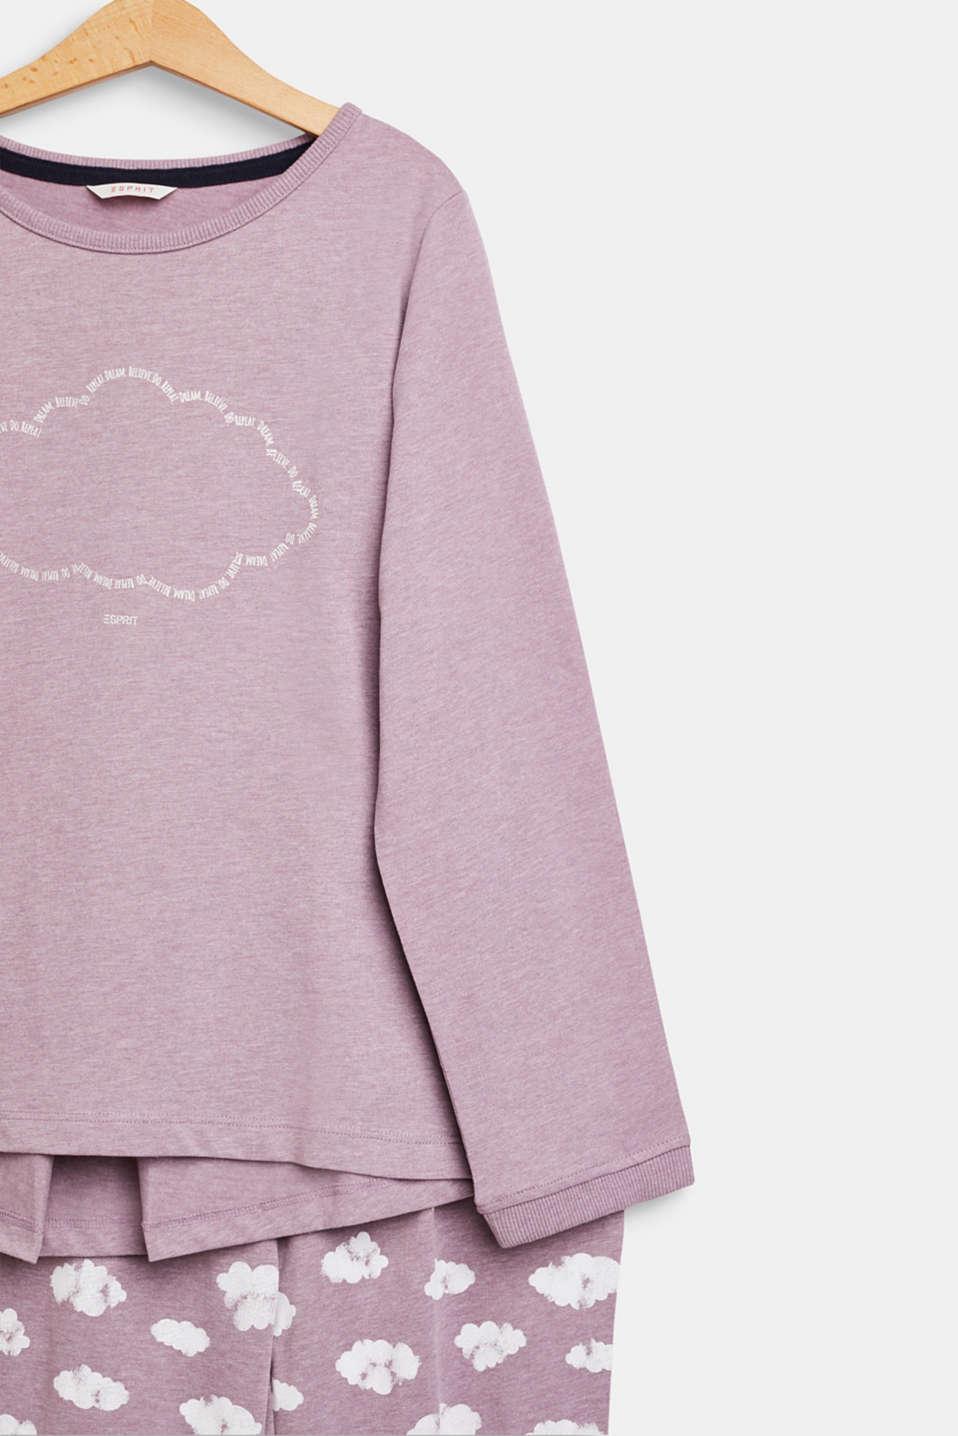 Pyjamas, MAUVE, detail image number 2